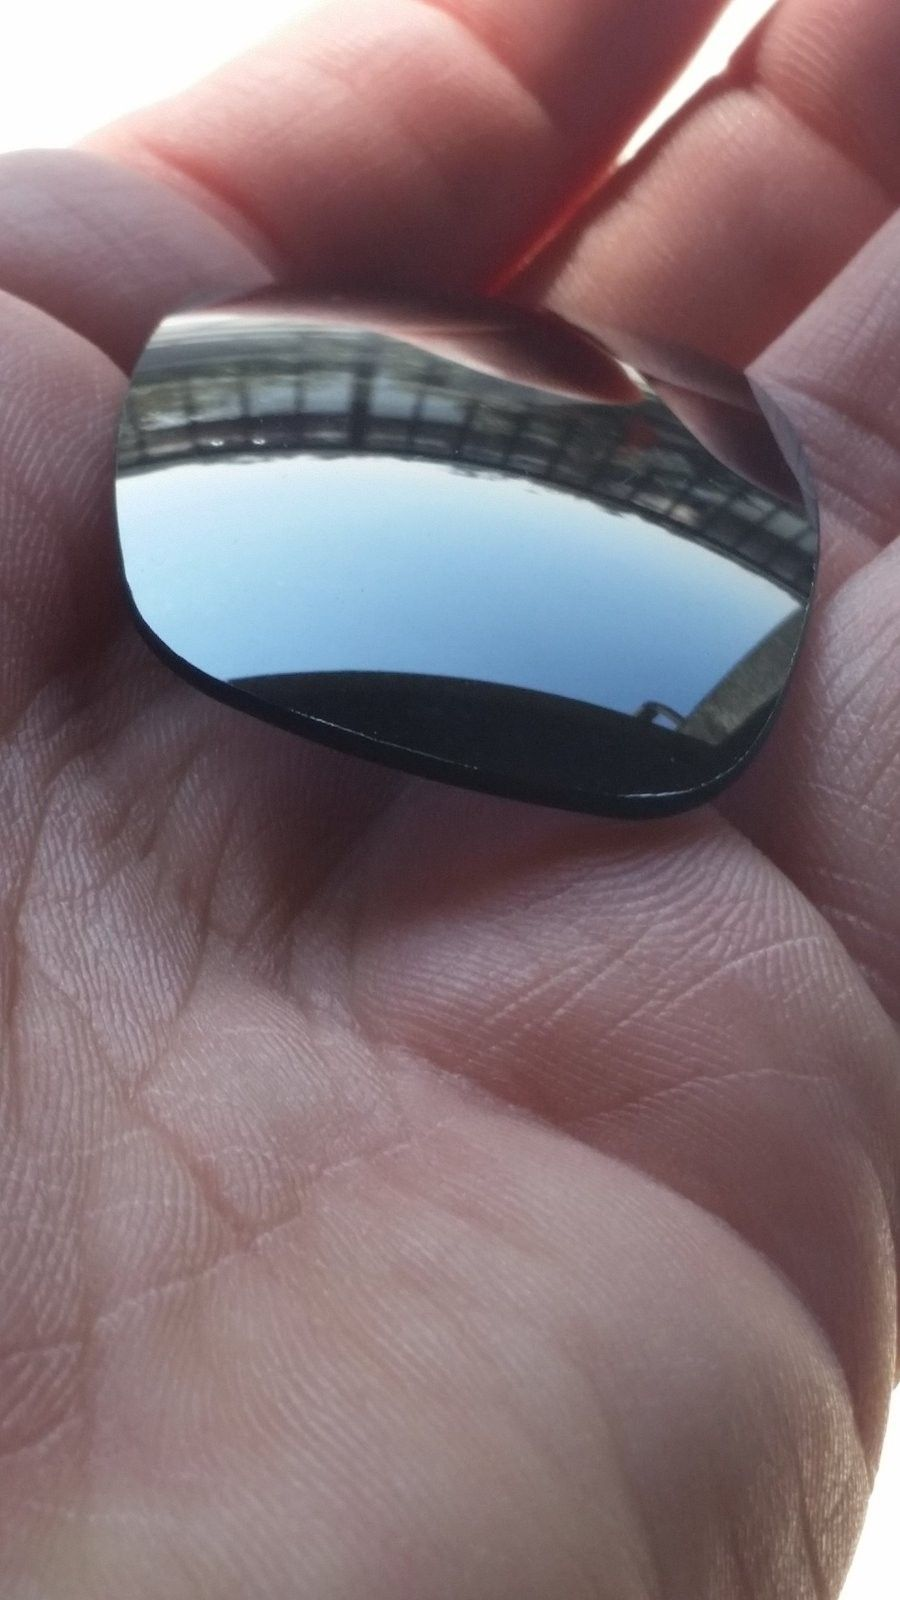 Oakley Ducati and Black iridiumJuliet lenses - uploadfromtaptalk1420652123898.jpg